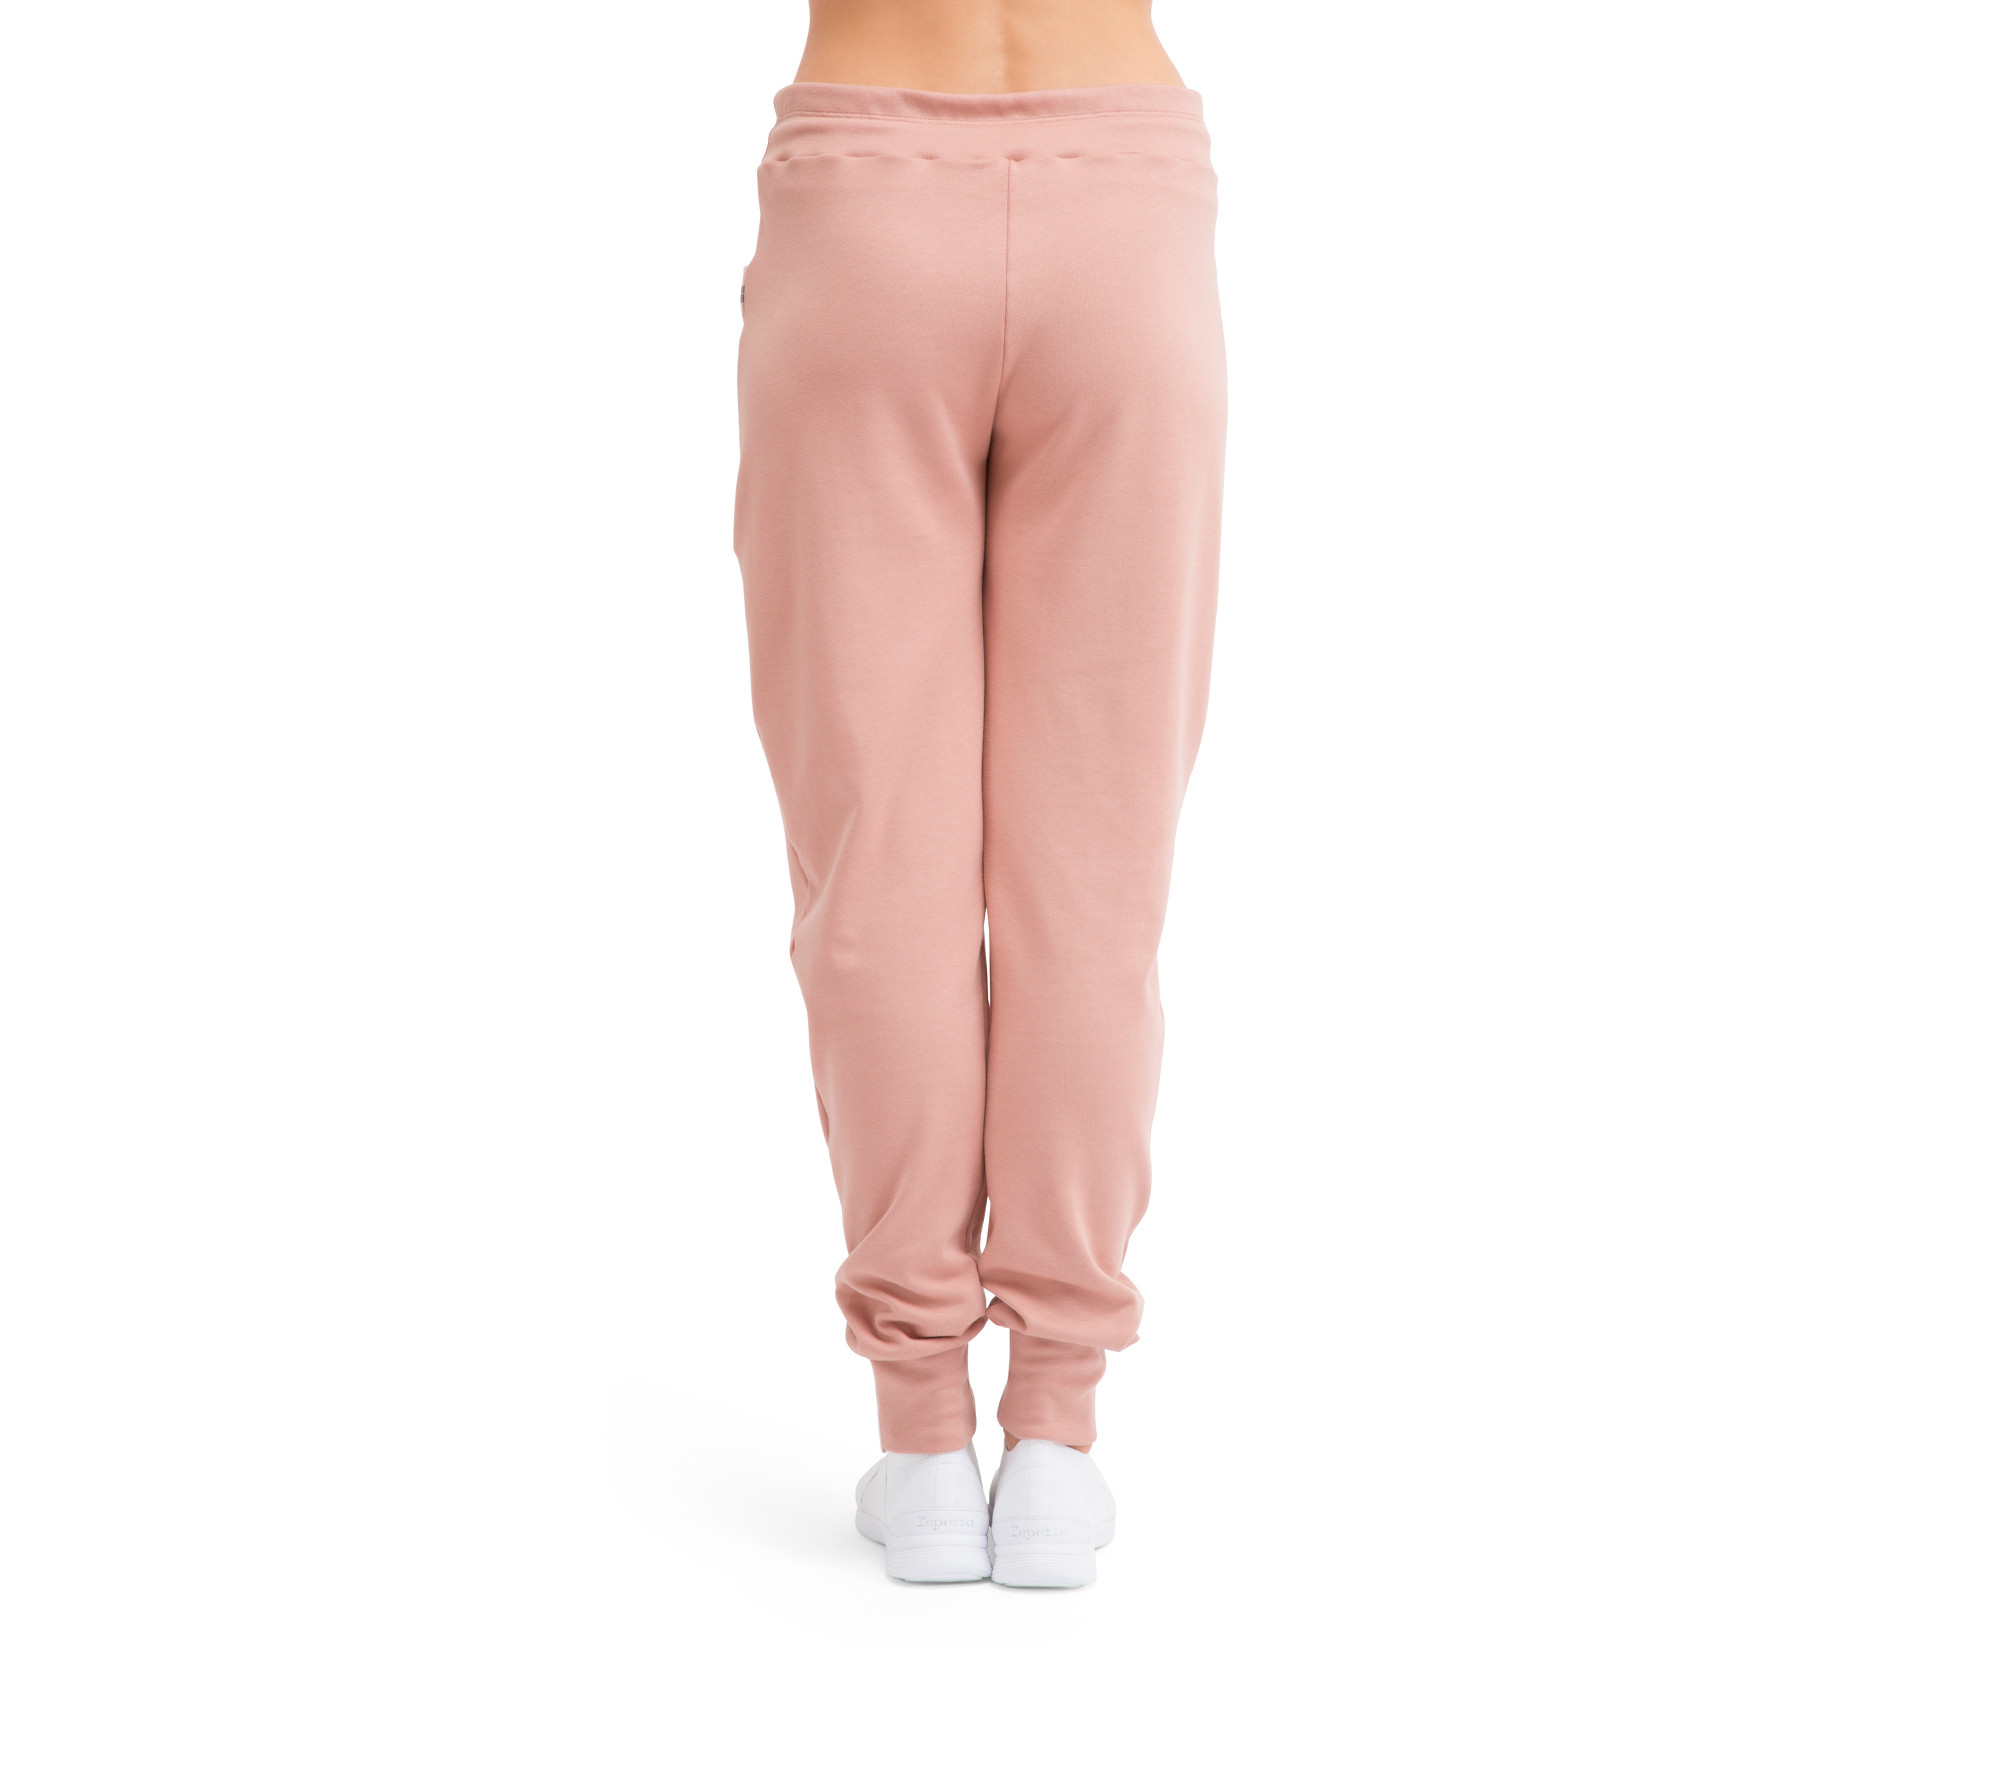 Pantalone loose in maglia